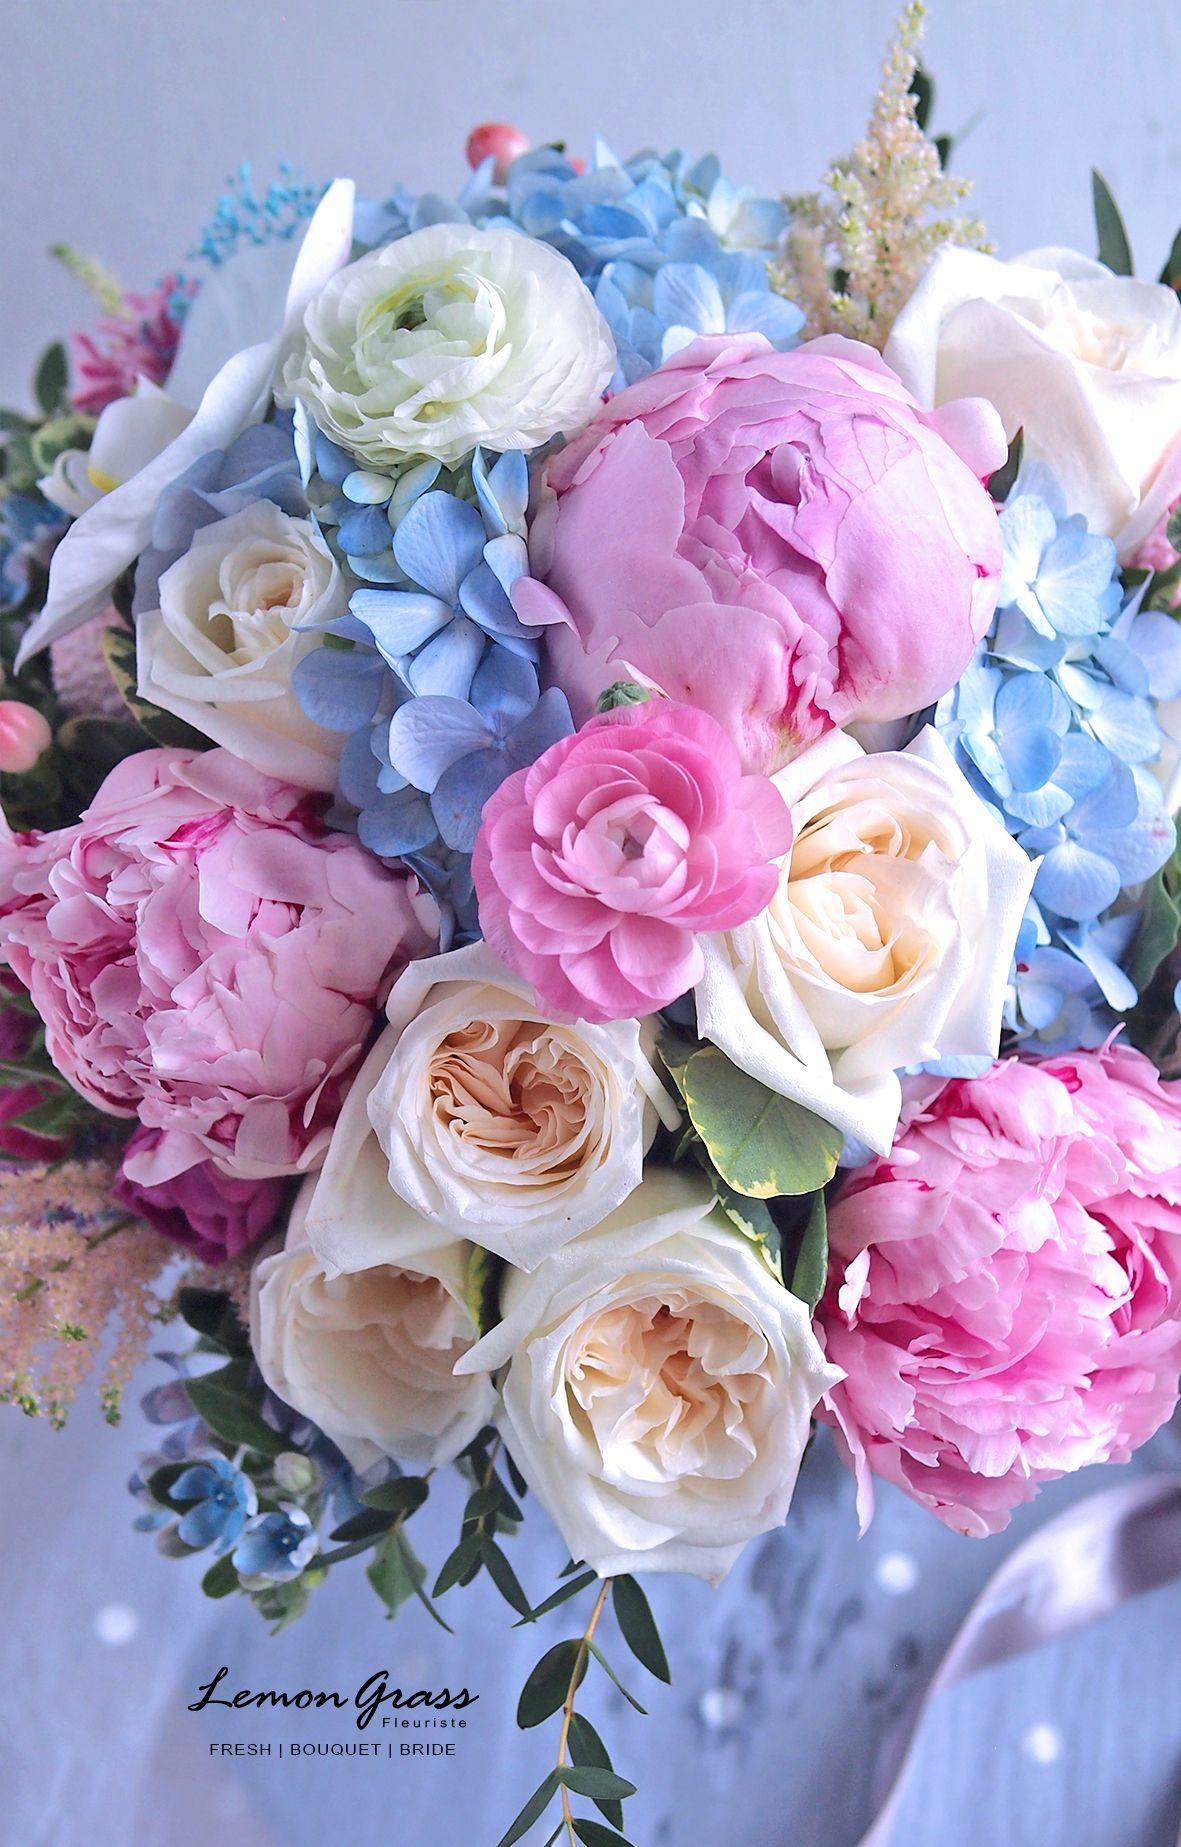 Pin by LemongrassWedding on Fresh Flower Bouquets   Pinterest ...